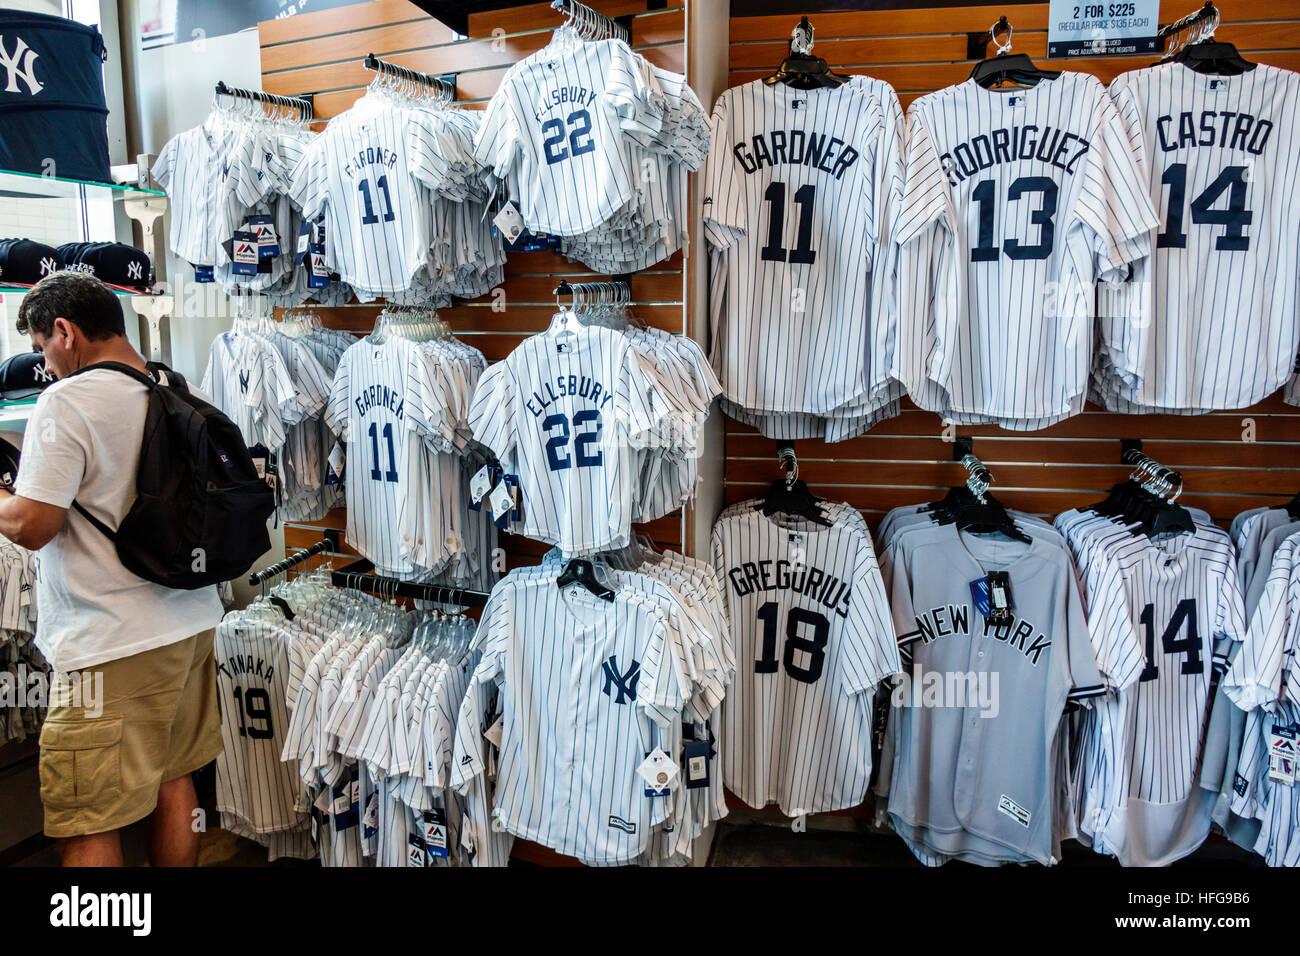 8add72d0df107 New York New York City NYC bronx ny Yankees estadio Yankee Stadium compras  Gift shop tienda equipo sports Team mercancía camiseta béisbol mostrar venta